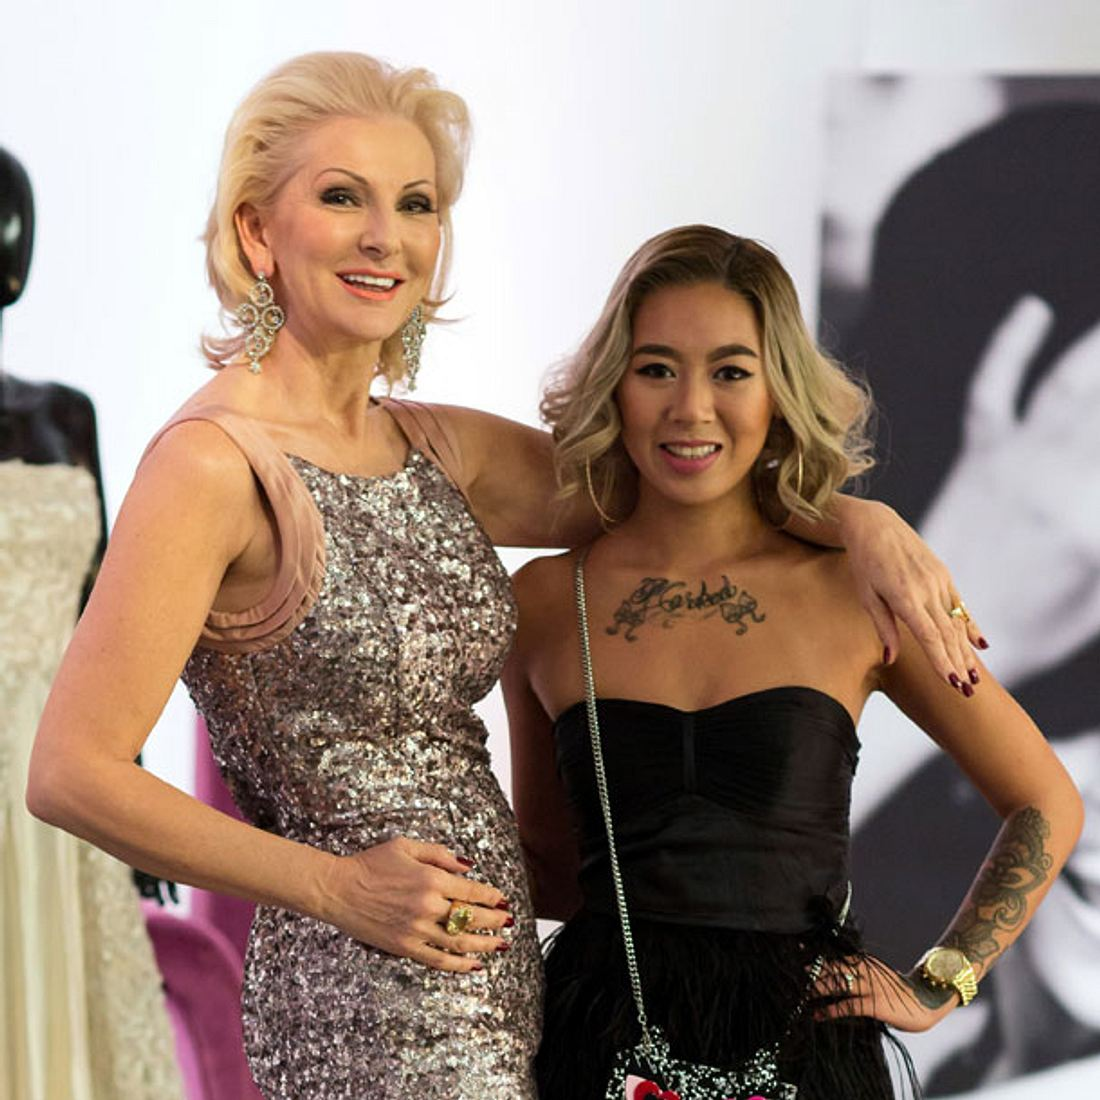 Shopping Queen des Jahres - Désirée Nick und Kelly